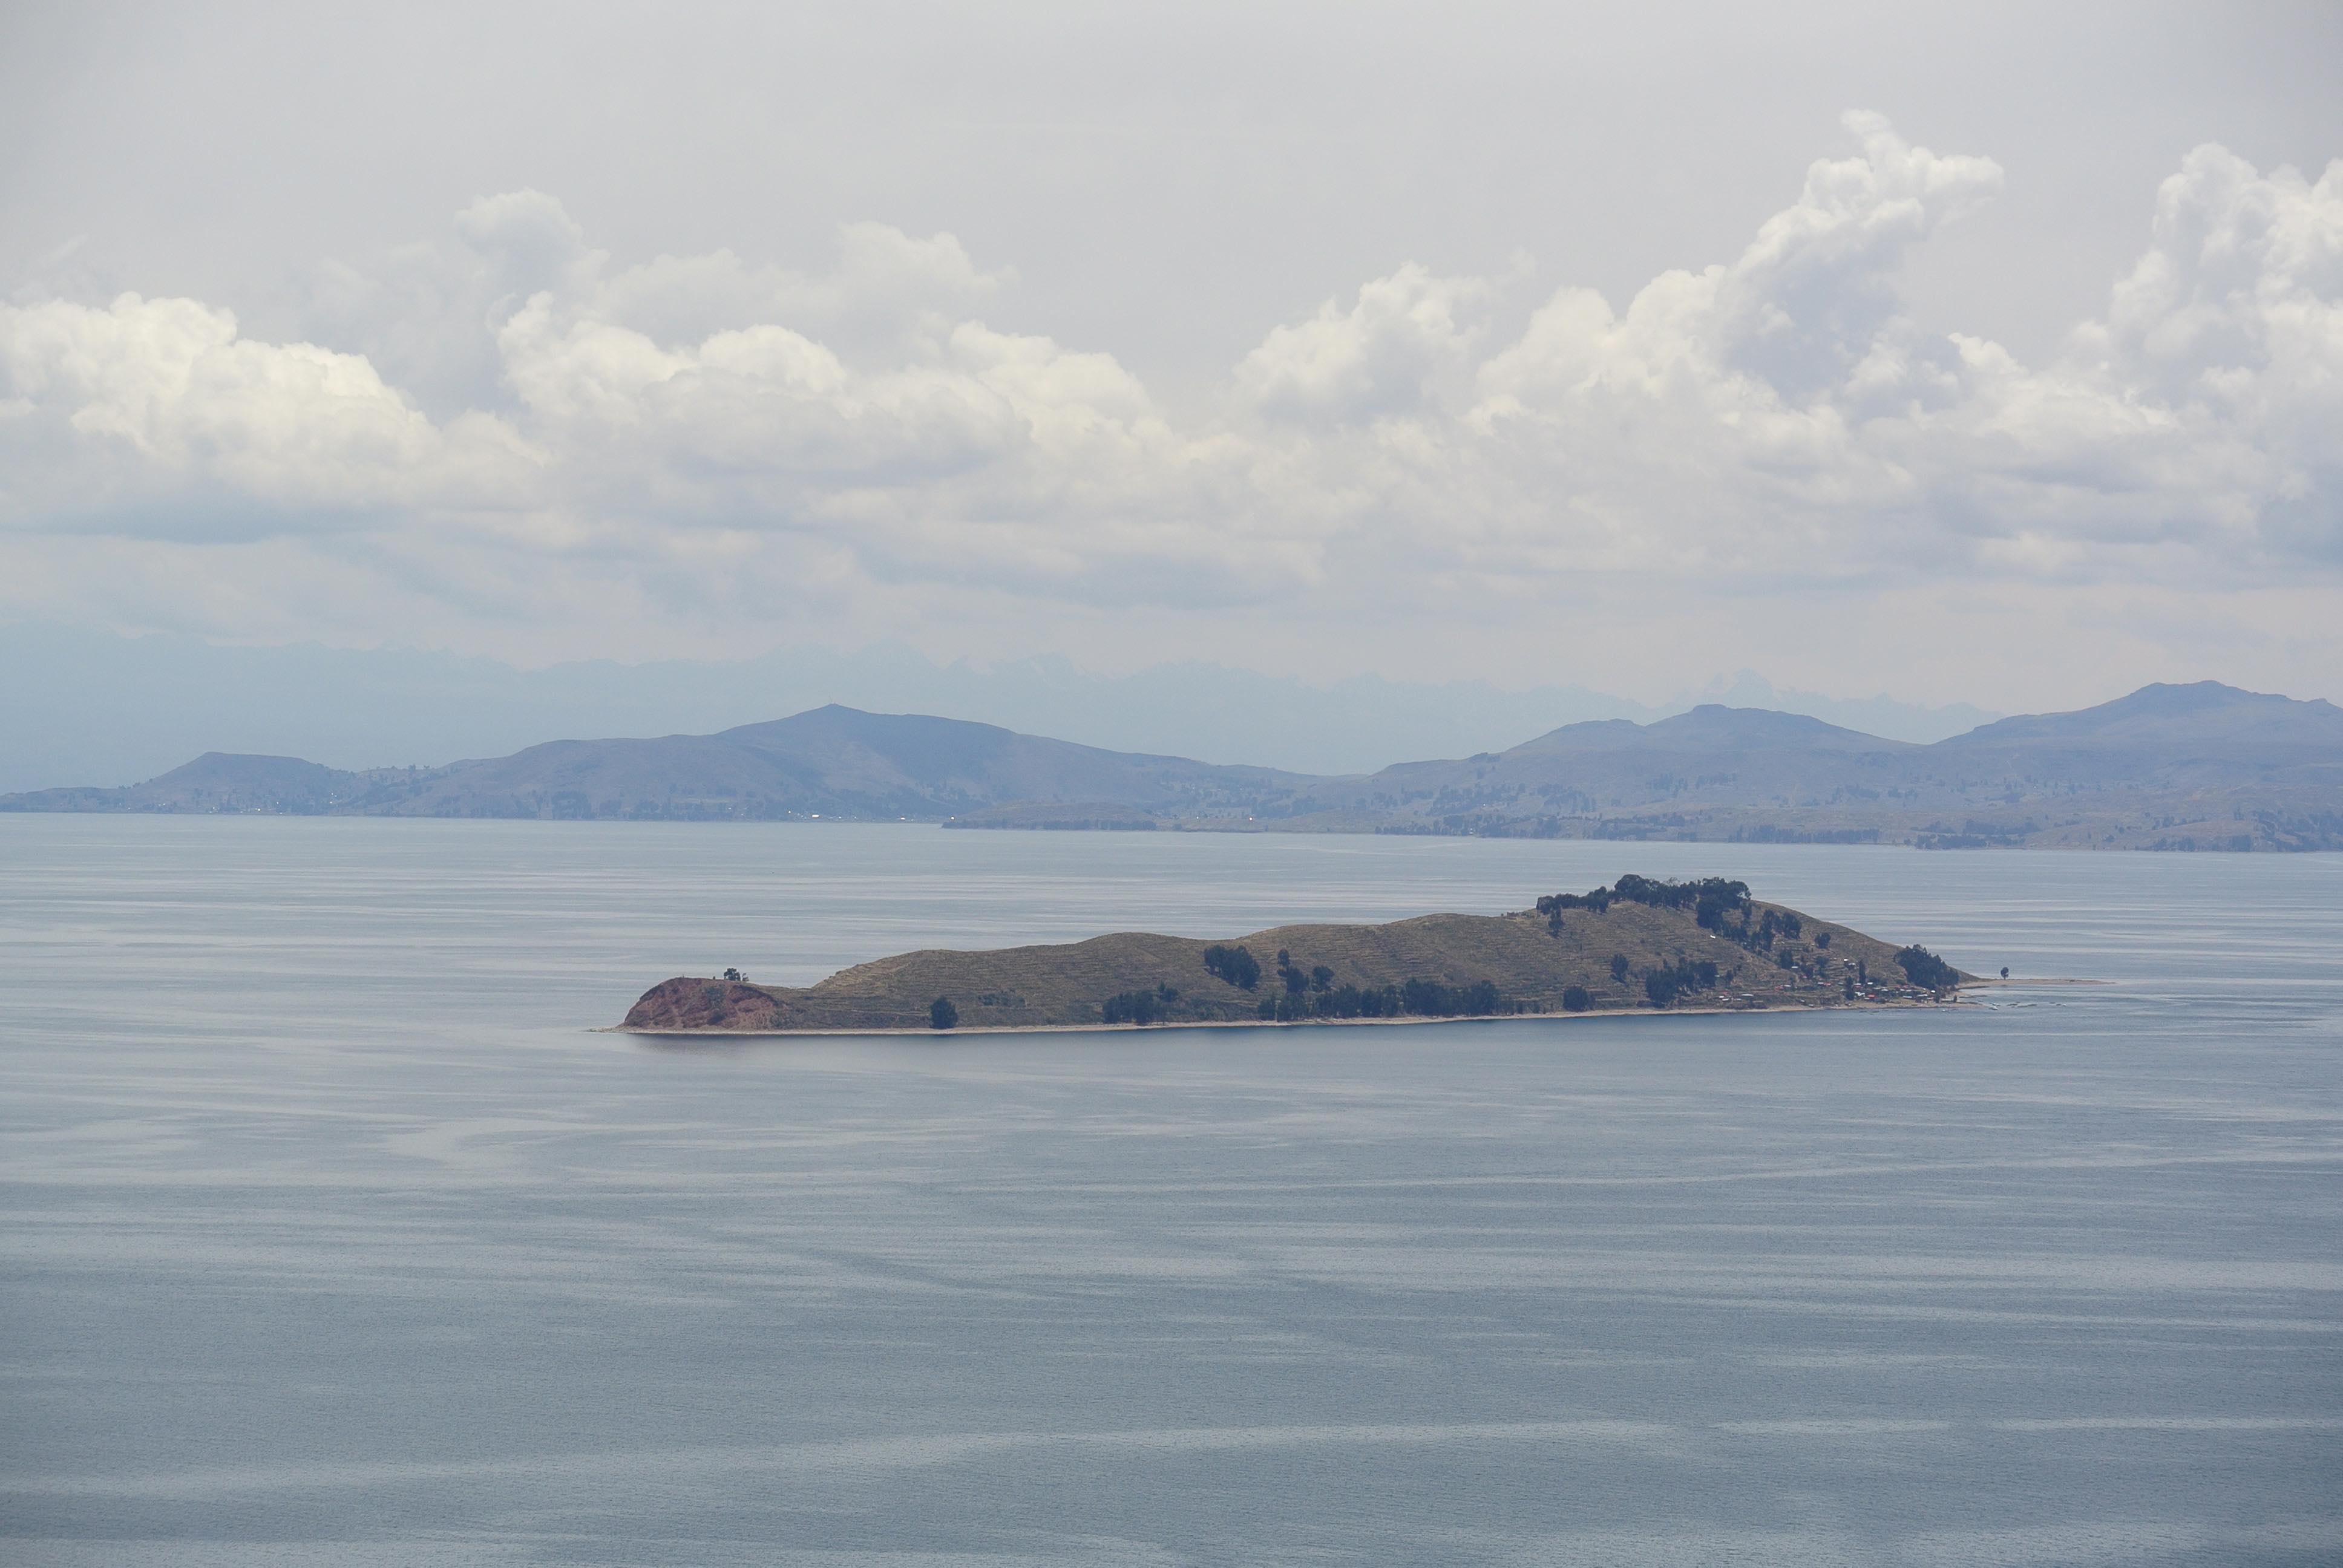 039 1911 Isla del Sol 31jpeg